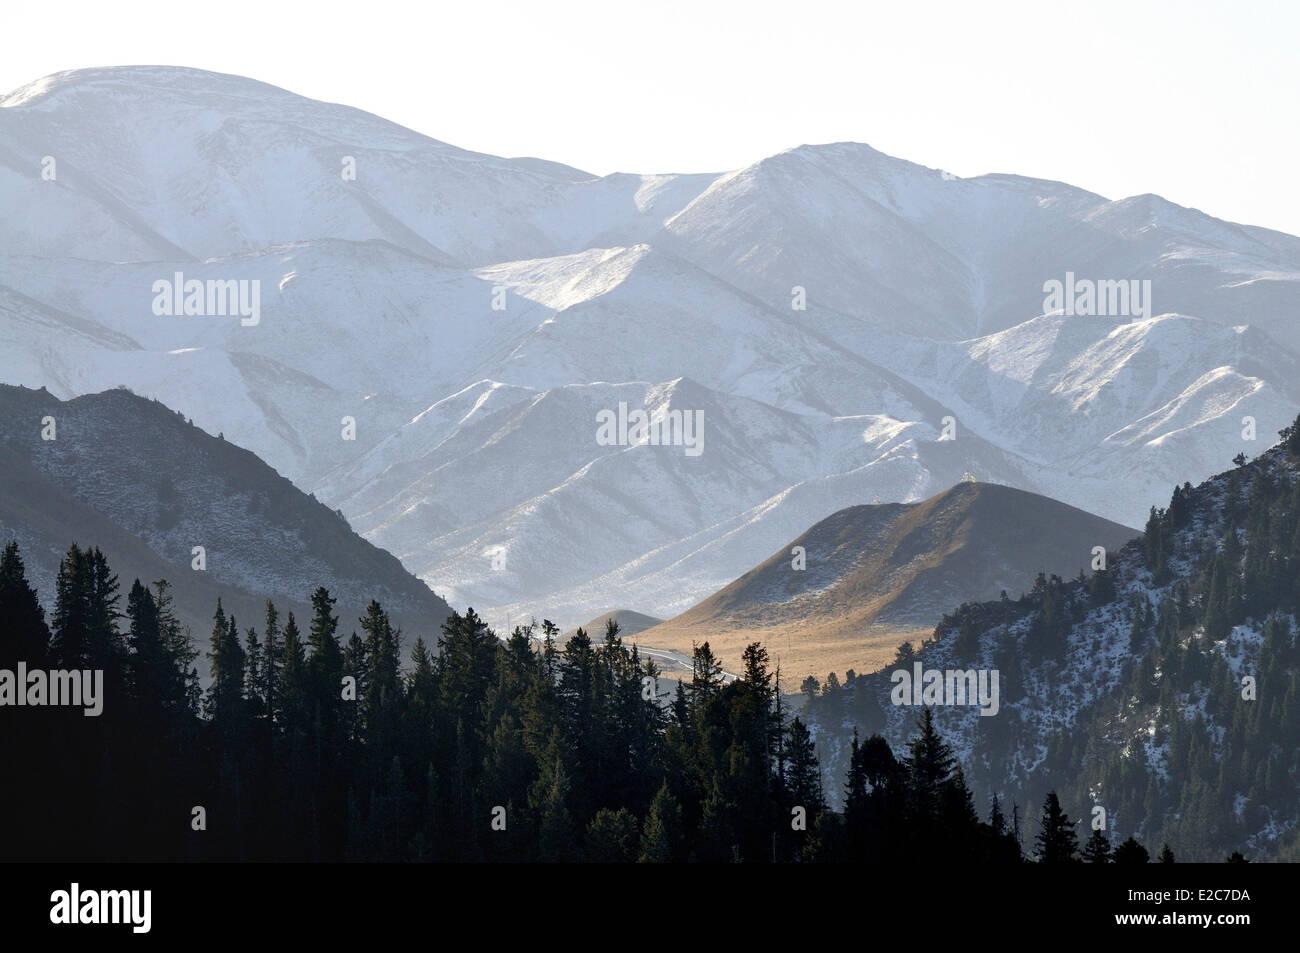 La Chine, la Province de Qinghai, Amdo, Tongren (Rebkong) comté, Tashi Kyil alentours Monastère Photo Stock